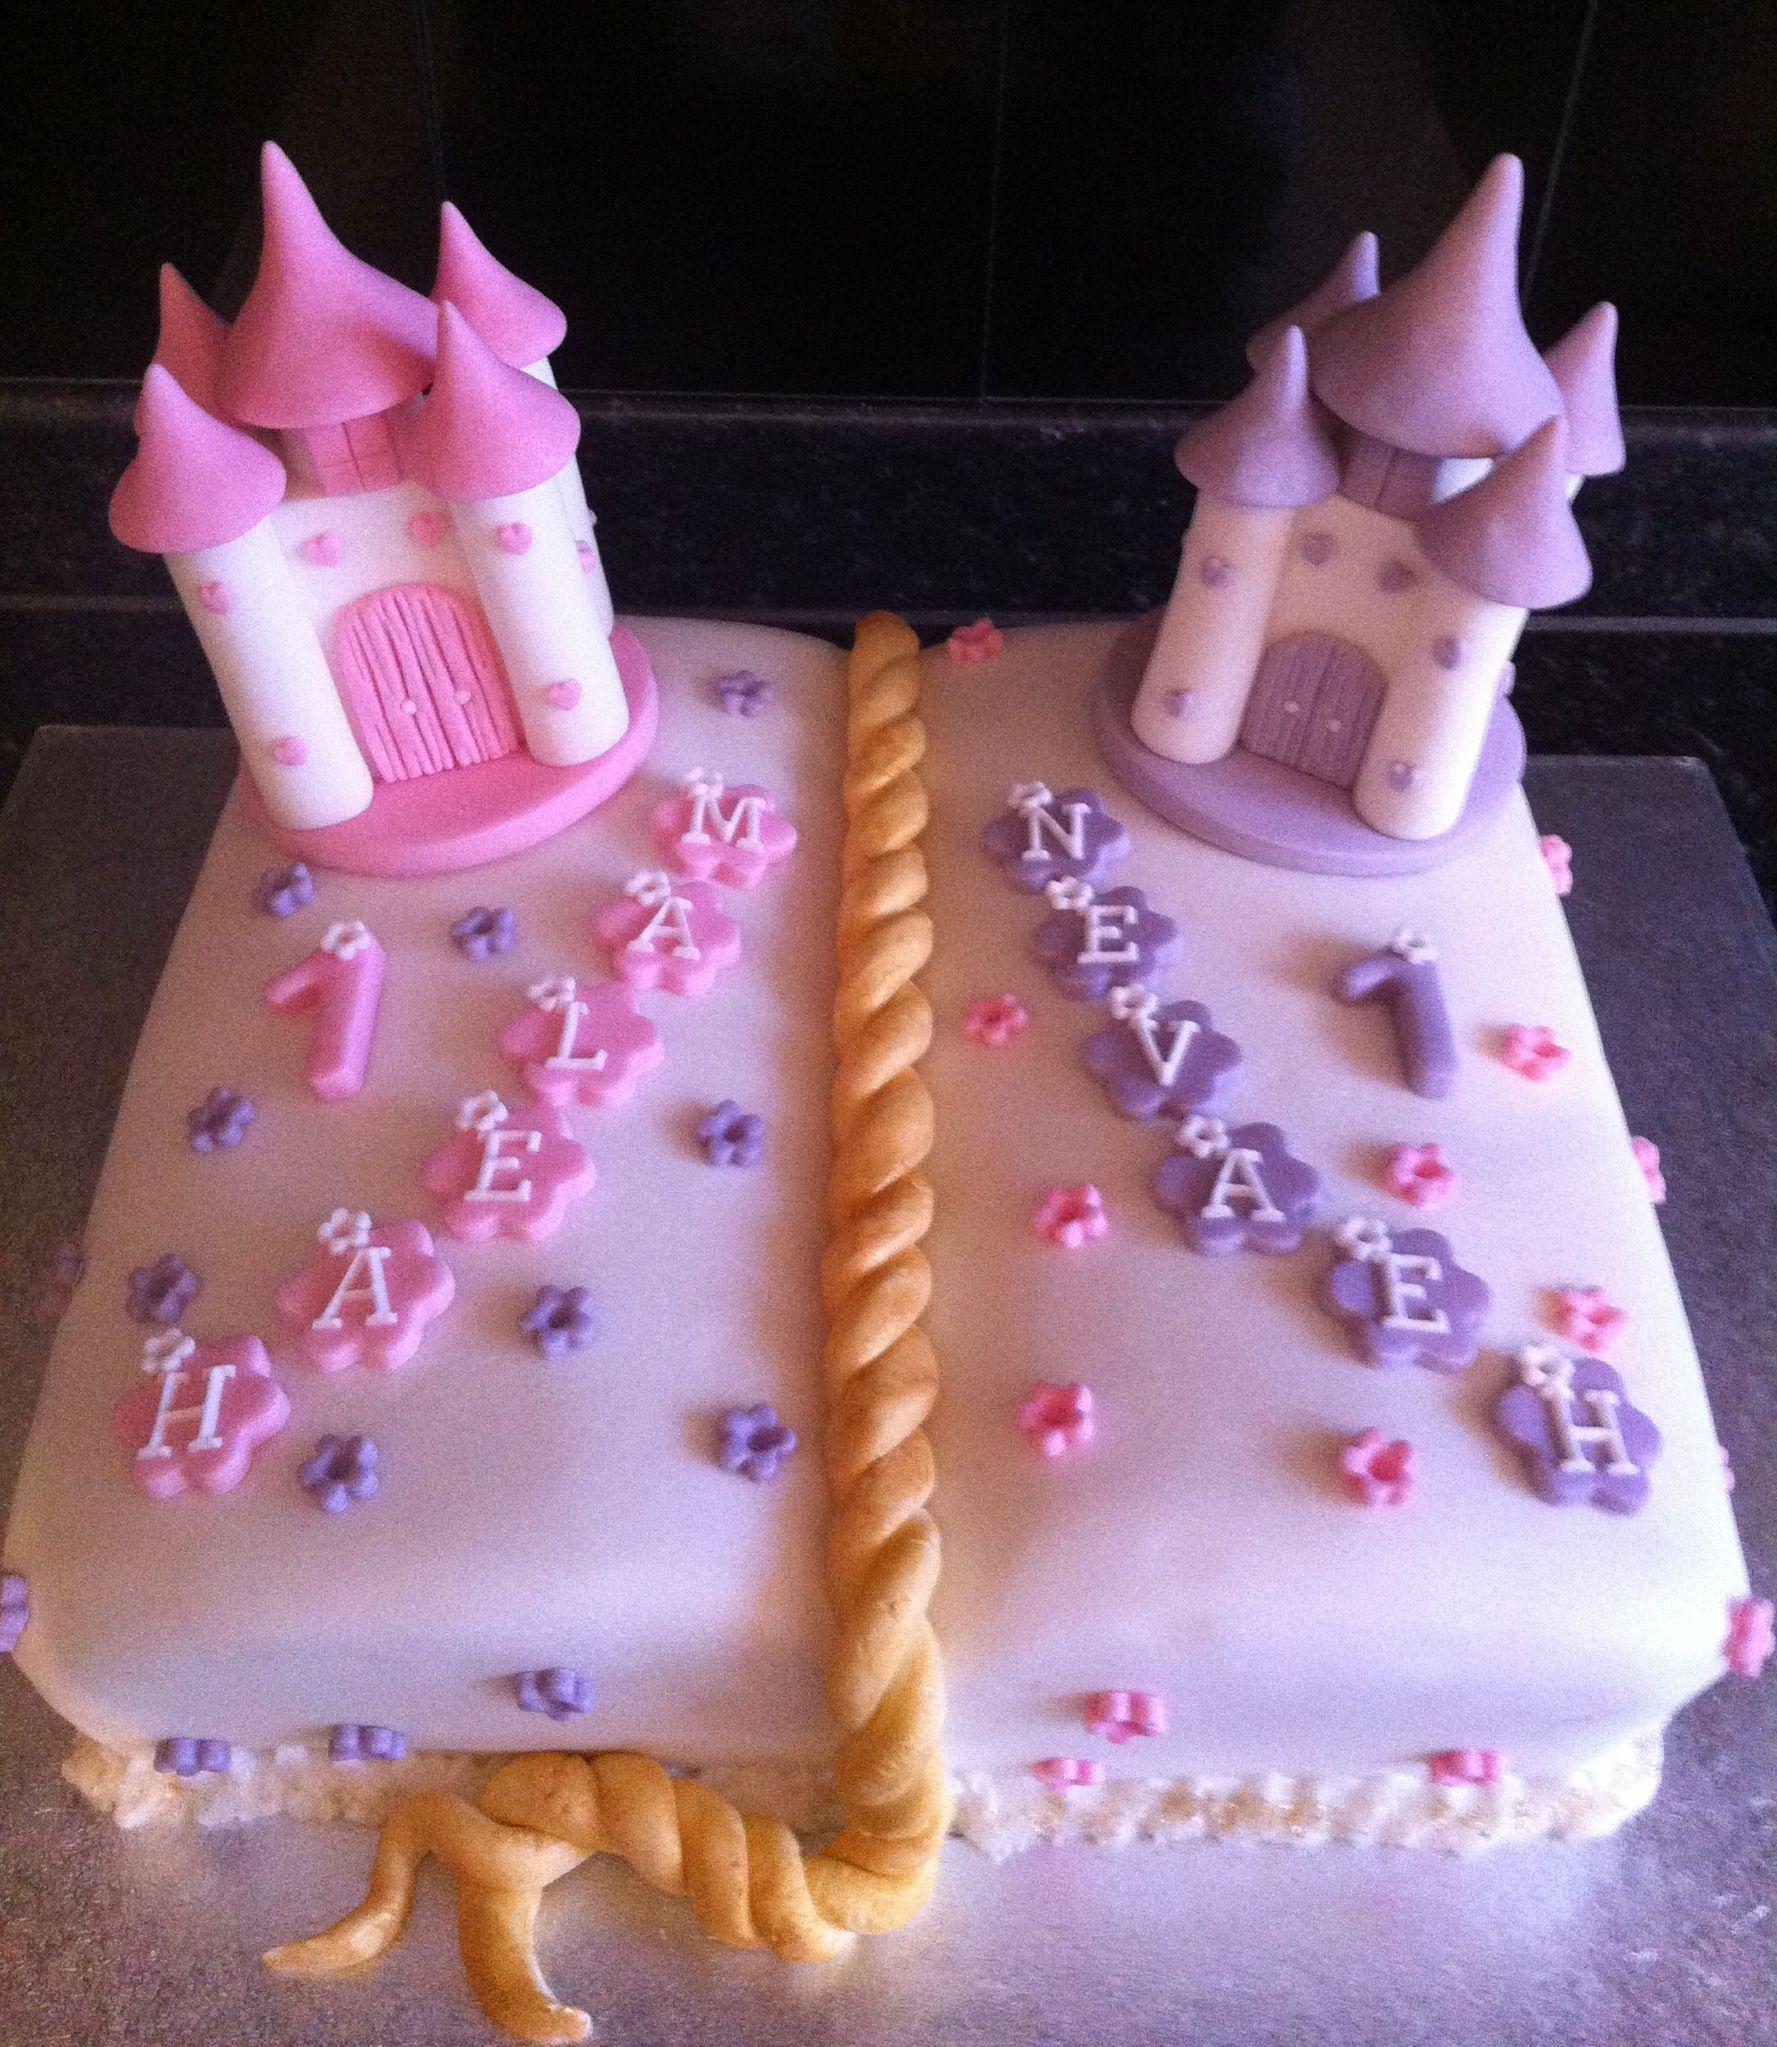 Torta tlet iker lnyoknak Twins Birthday cake Tortk Ikreknek